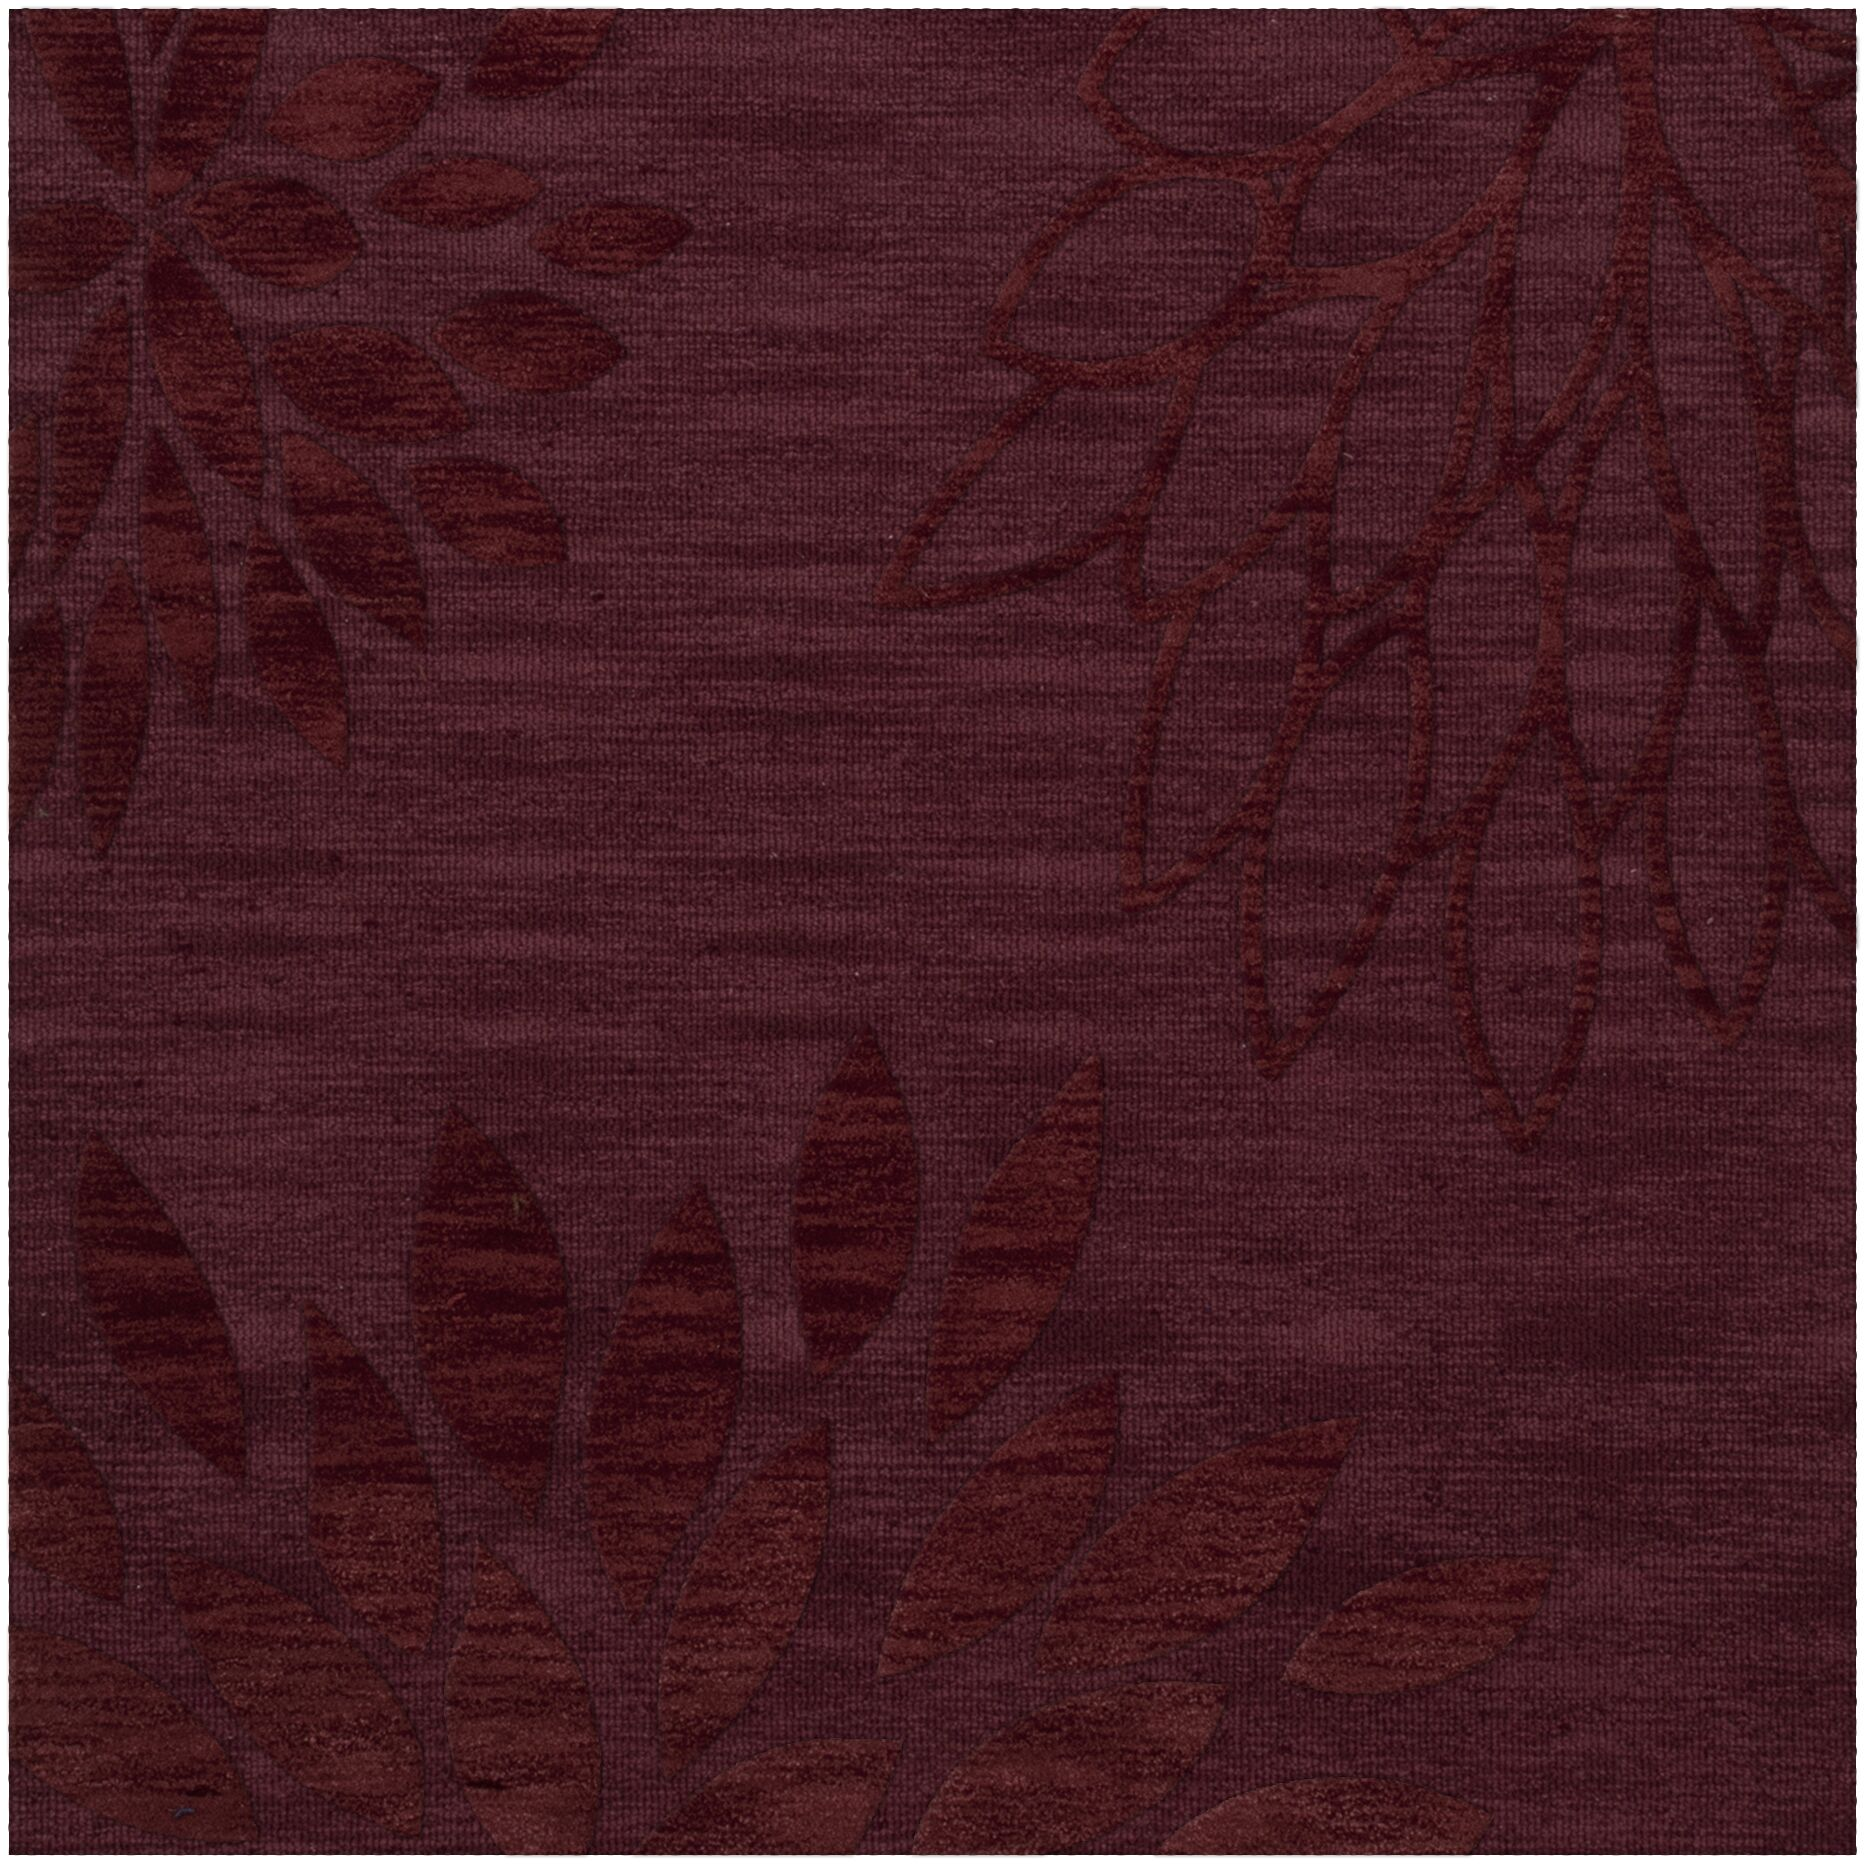 Bao Burgundy Area Rug Rug Size: Square 6'